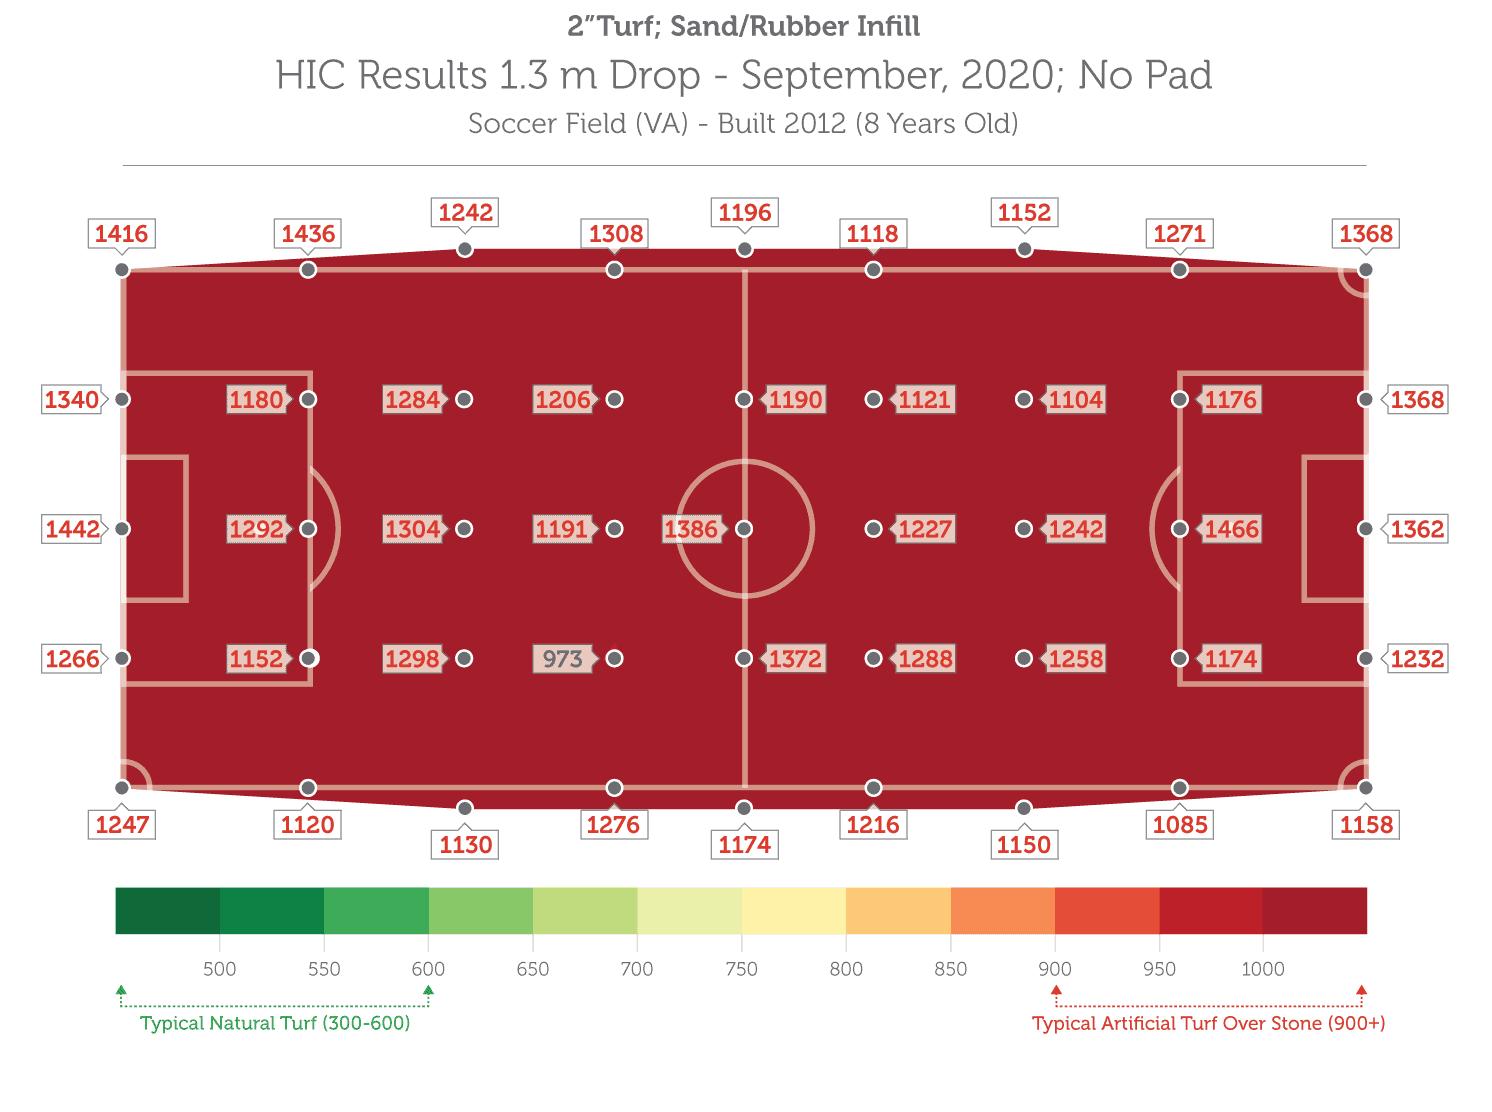 HIC Results 1.3m Drop – September, 2020; No Pad